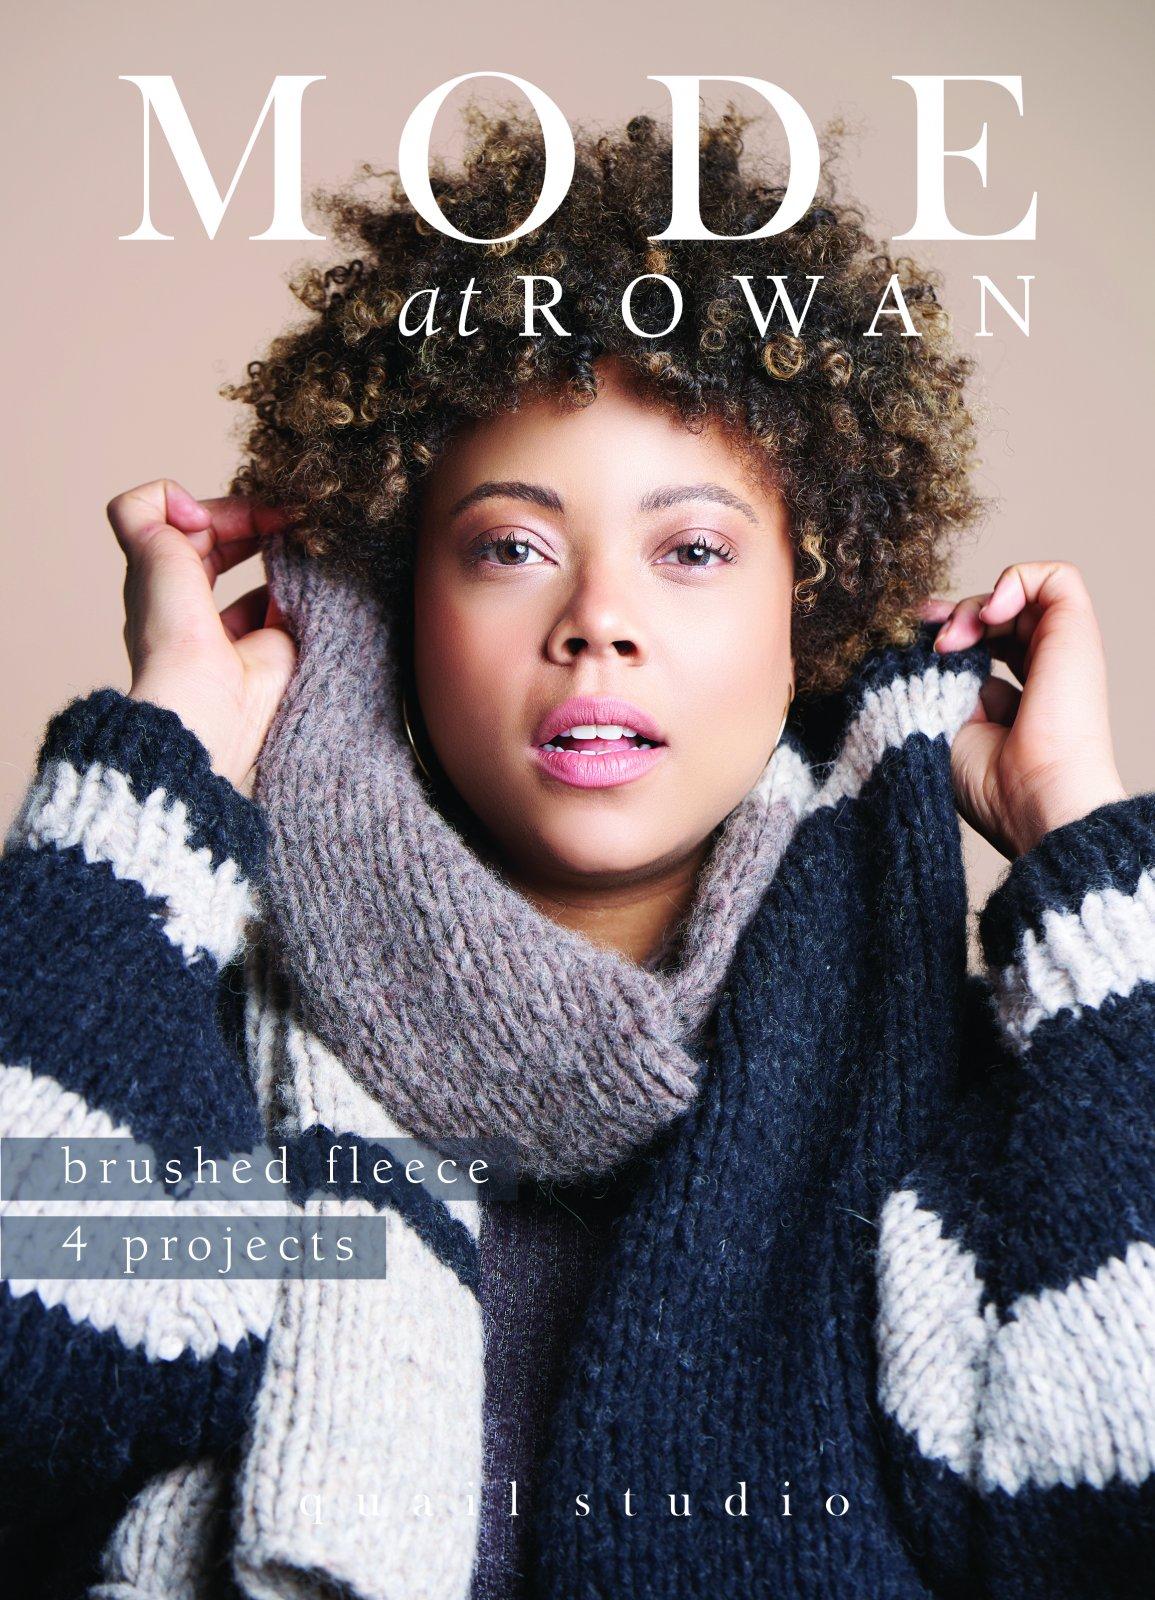 Rowan Brushed Fleece 4 Projects by Quail Studio for Rowan